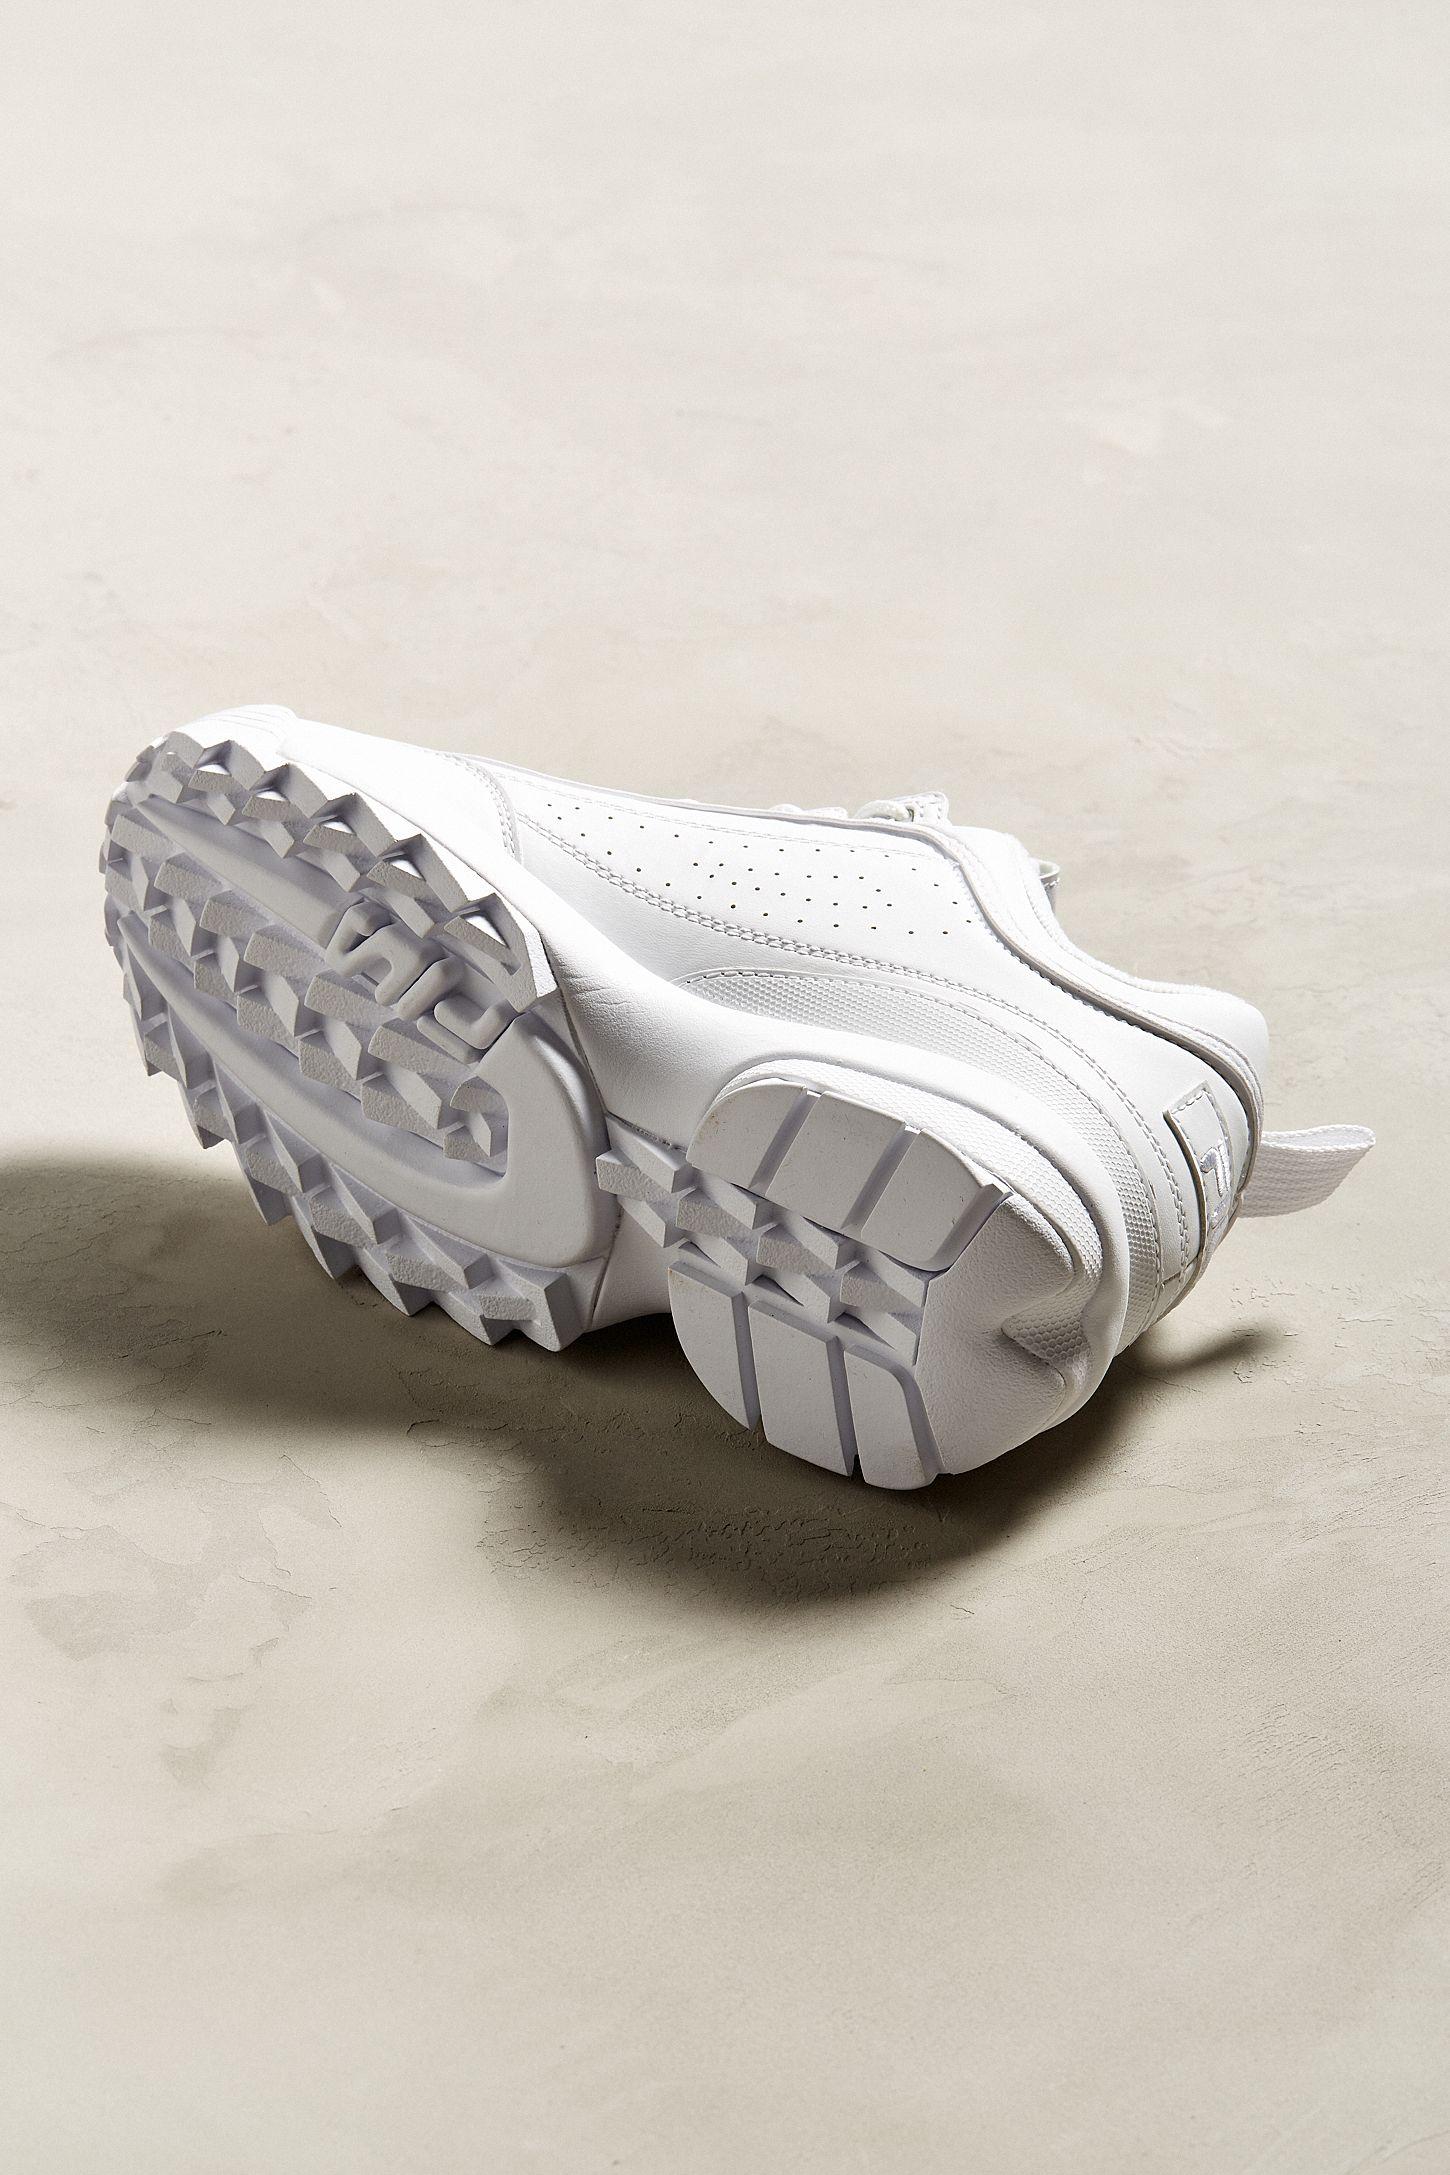 721ad8f4b3 FILA Disruptor 2 Sneaker | Urban Outfitters